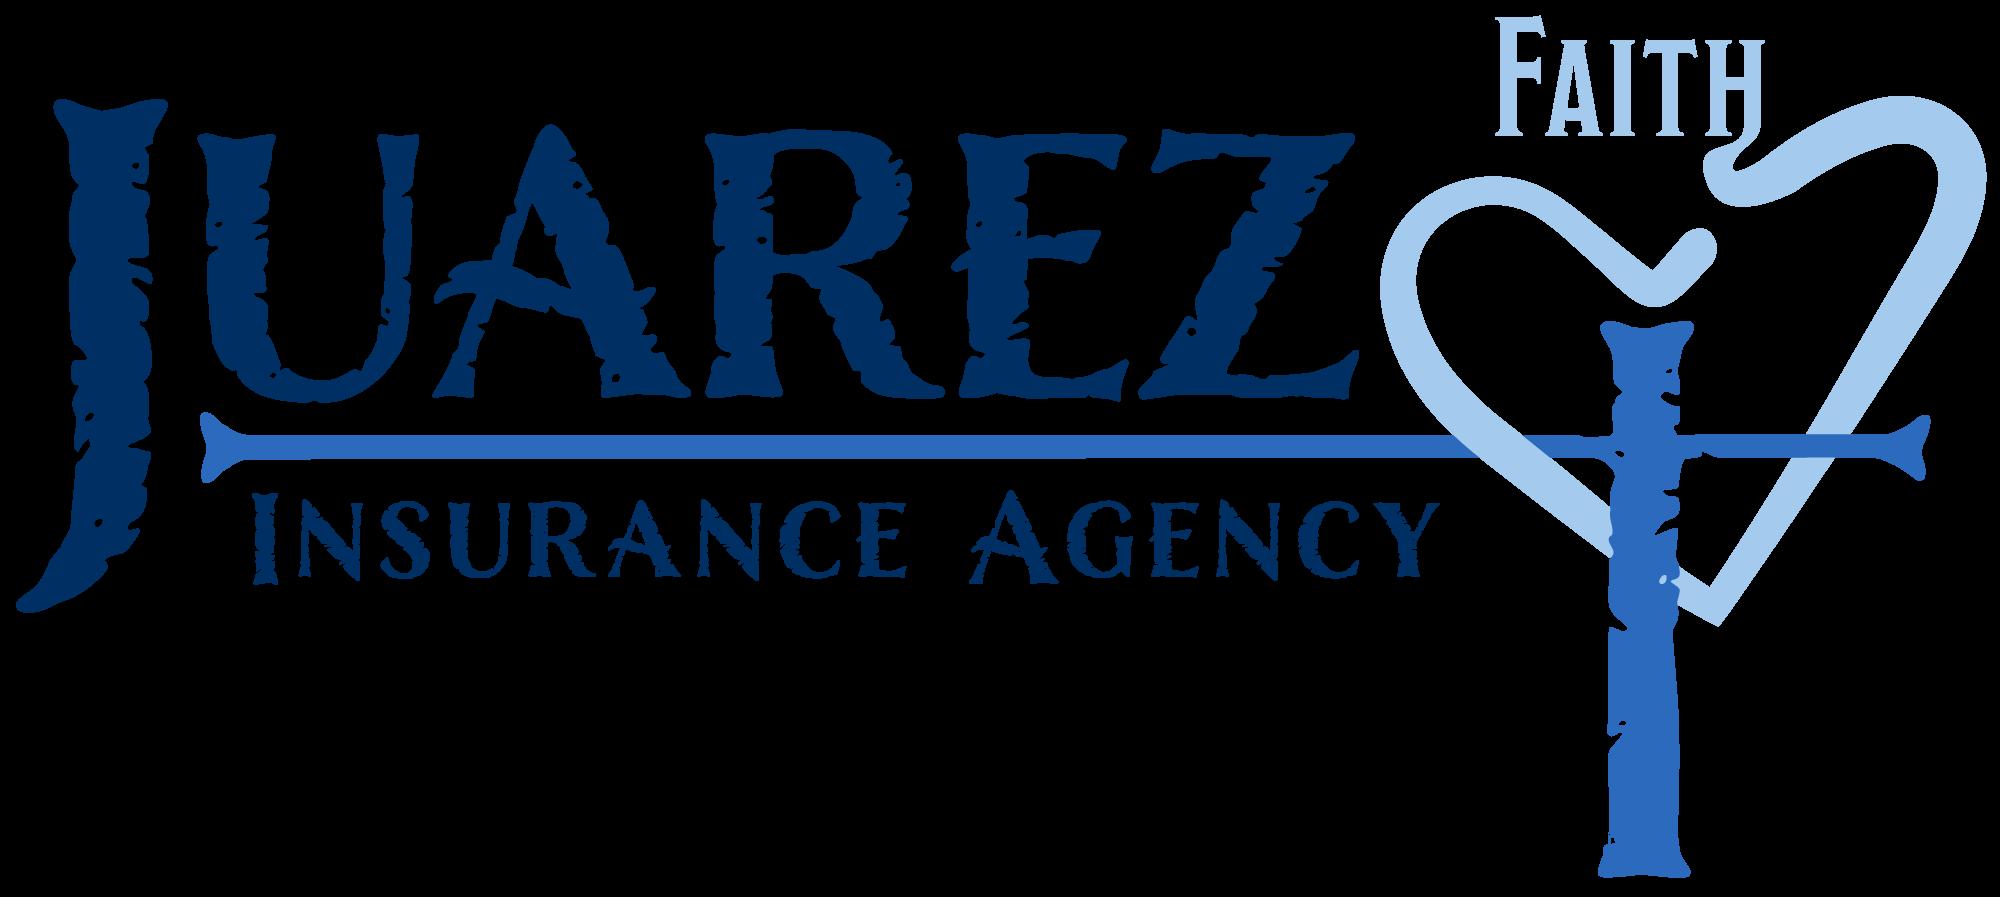 Juarez Insurance Agency Logo